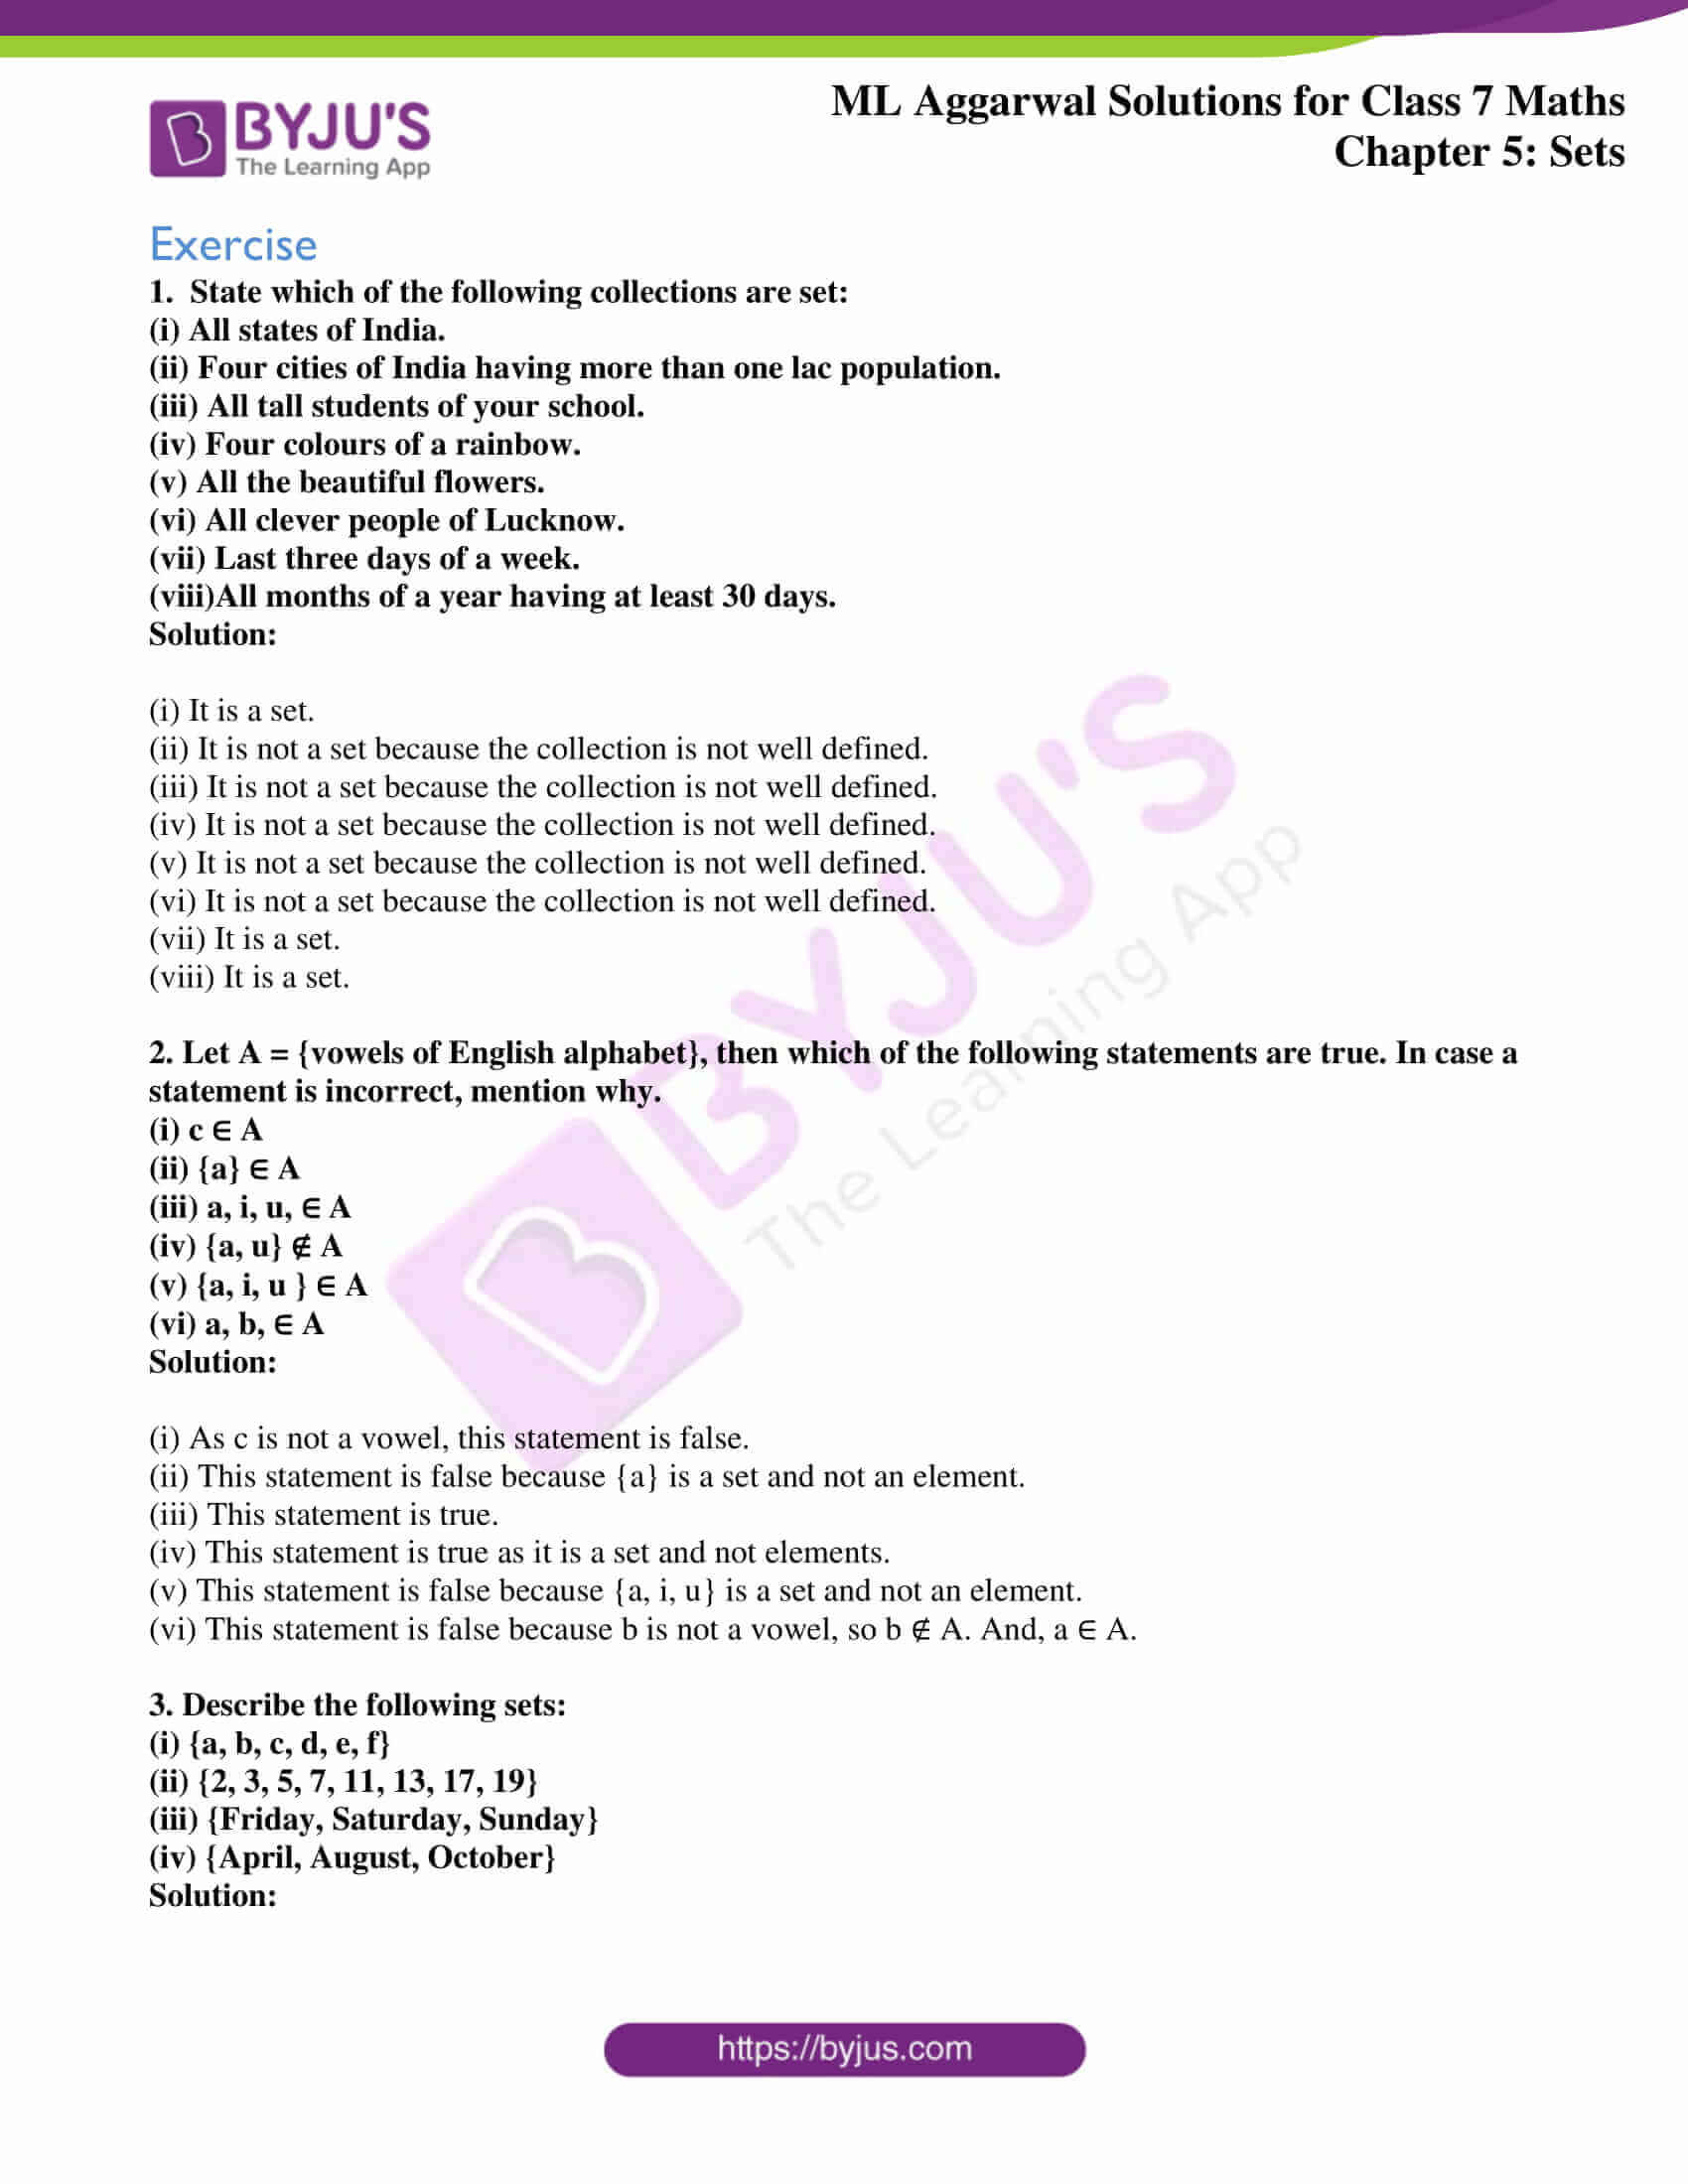 ml aggarwal sol class 7 maths chapter 5 1